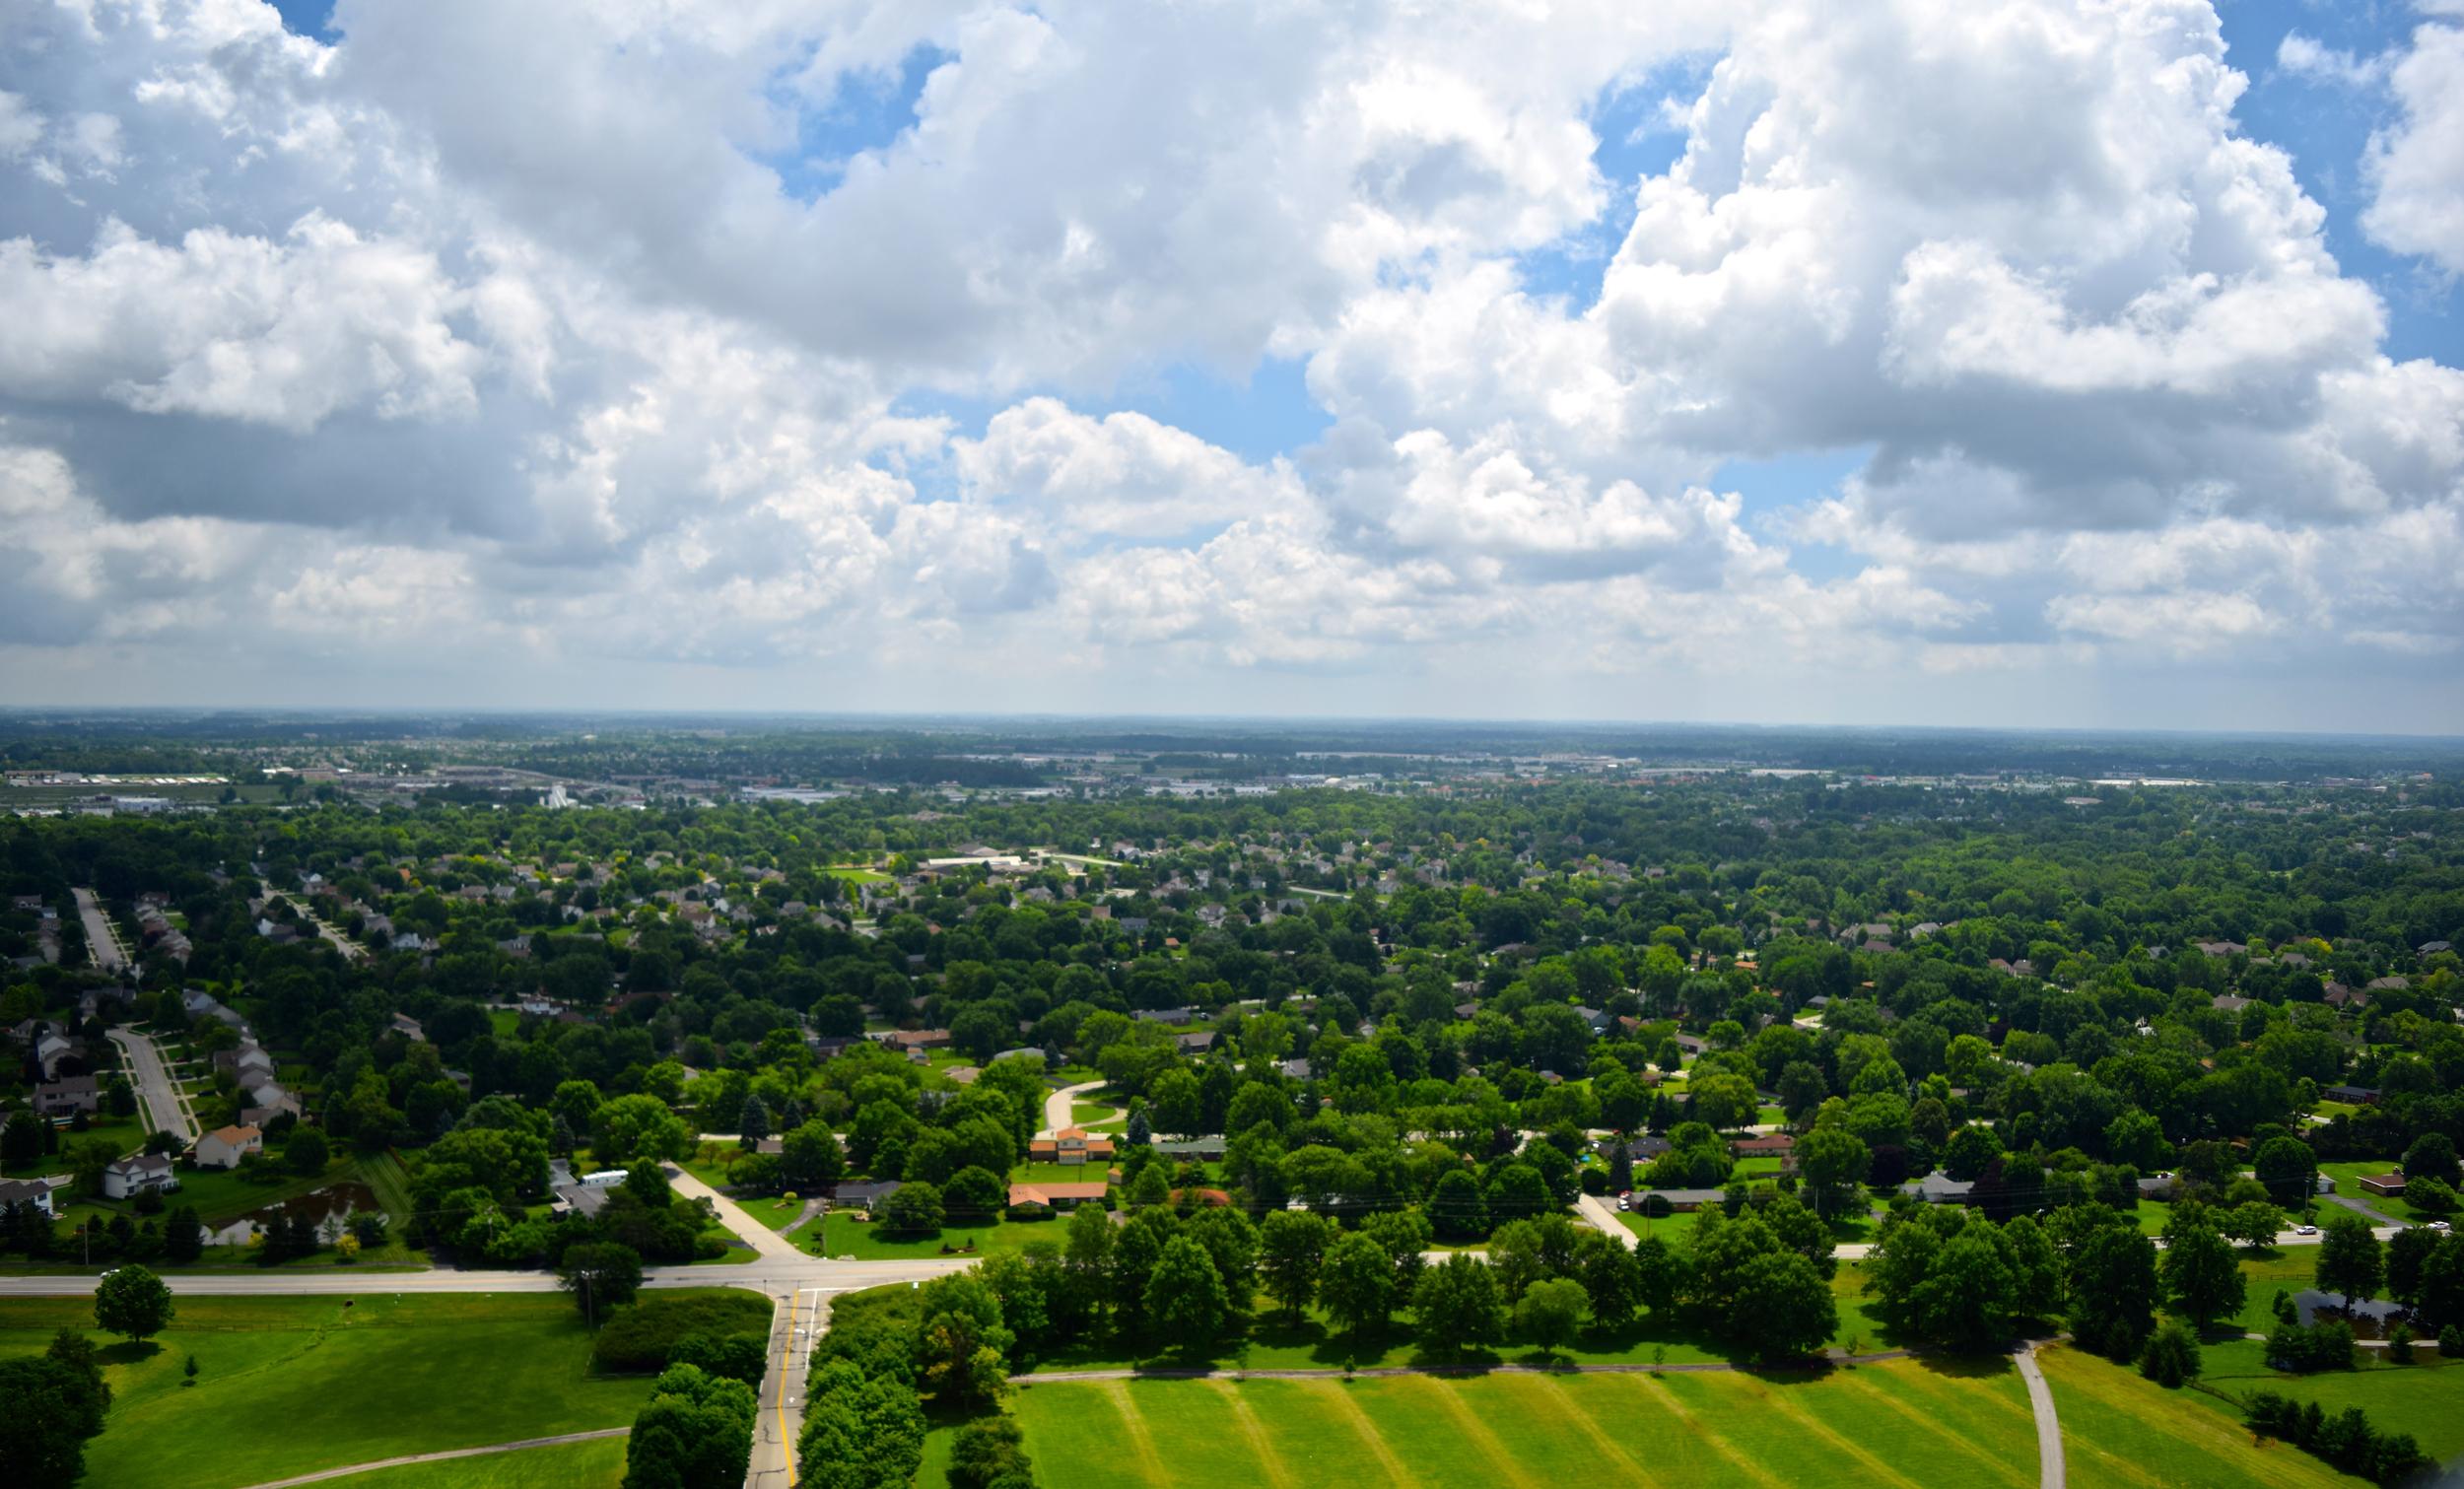 Airborne Landscape